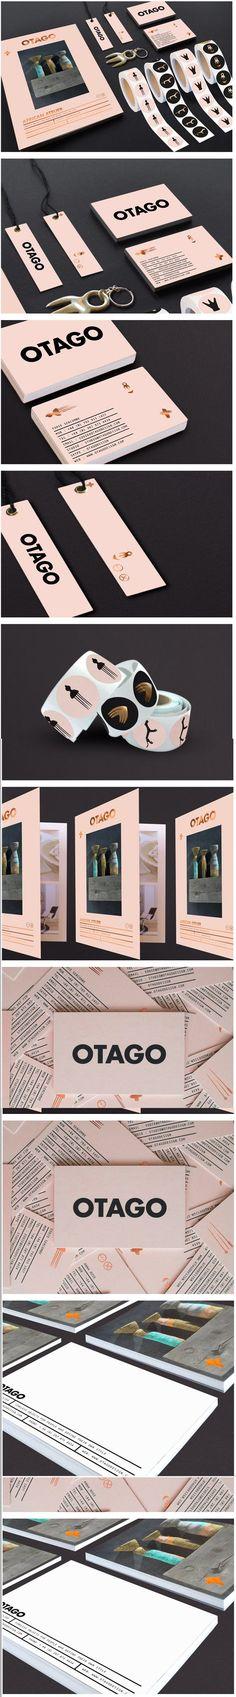 Otago Branding | Fivestar Branding – Design and Branding Agency & Inspiration Gallery